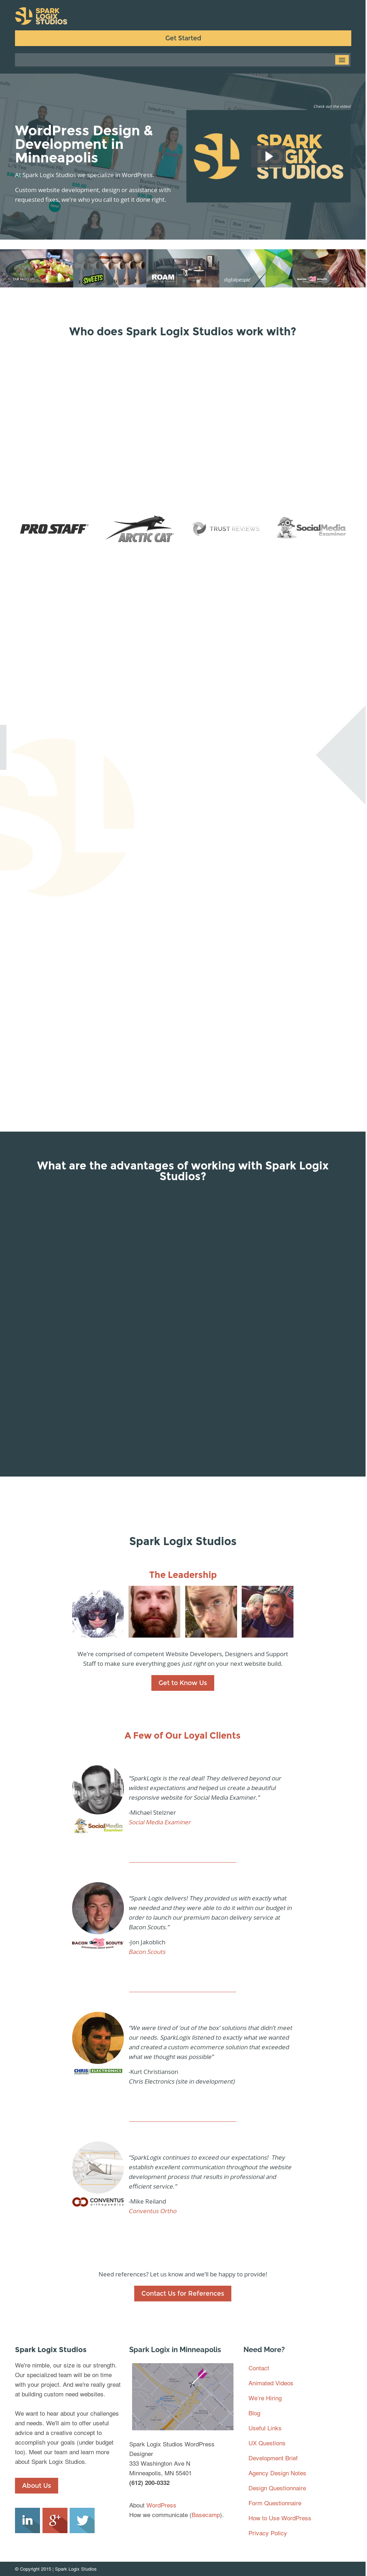 Spark logix